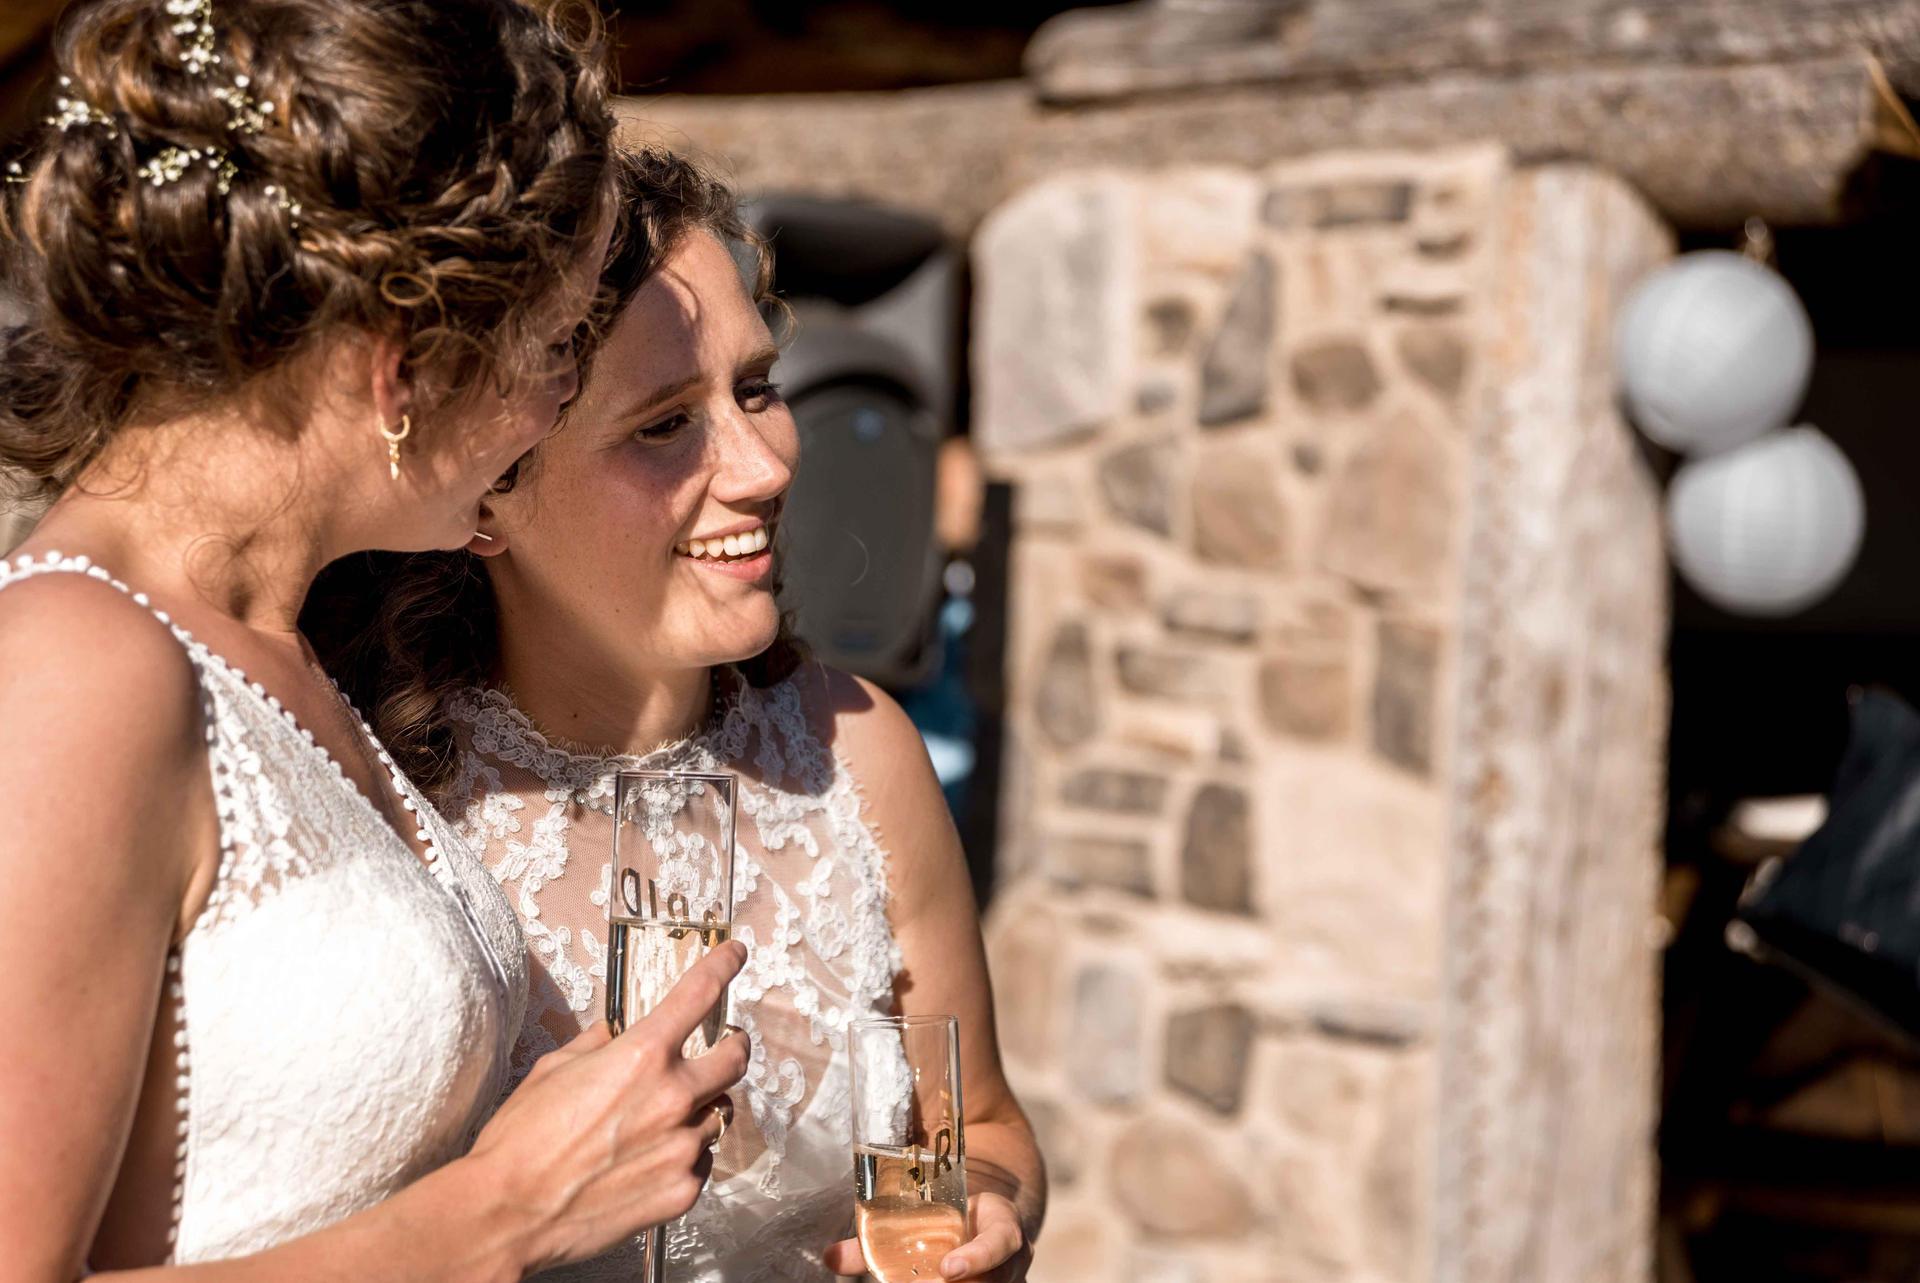 Bruiloft klein website -44.jpg